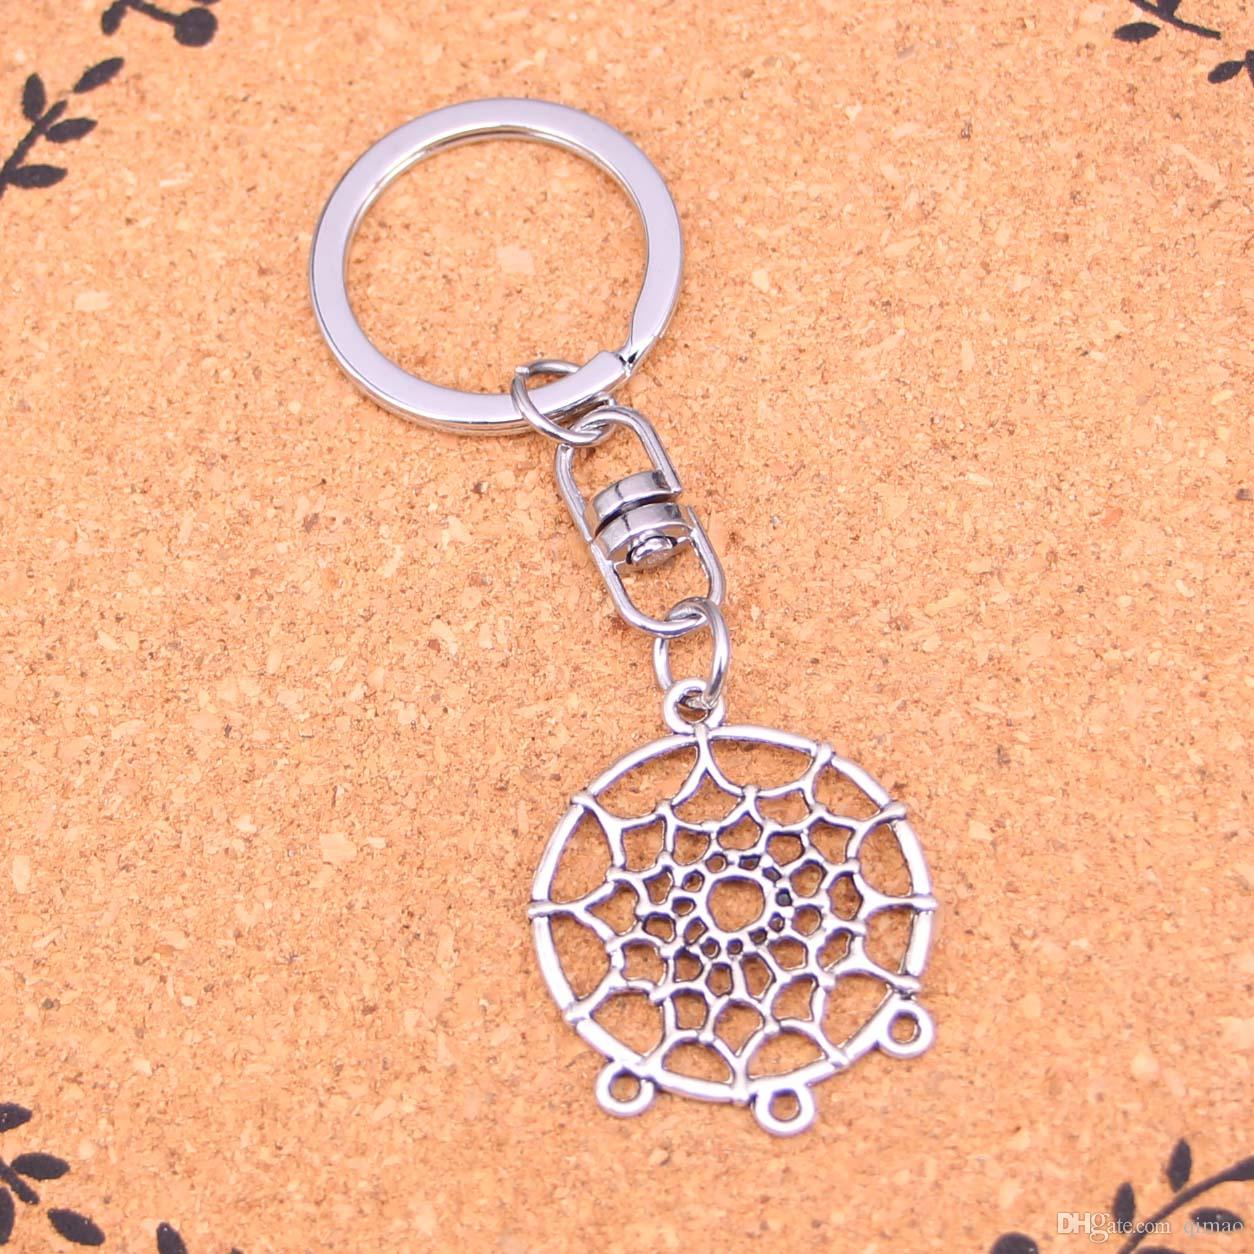 Fashion native american dream catcher chande Keychain For Men Trinket  Portachiavi Car Keyring Key Chain Ring Chaveiro Jewelry Gift Souvenirs